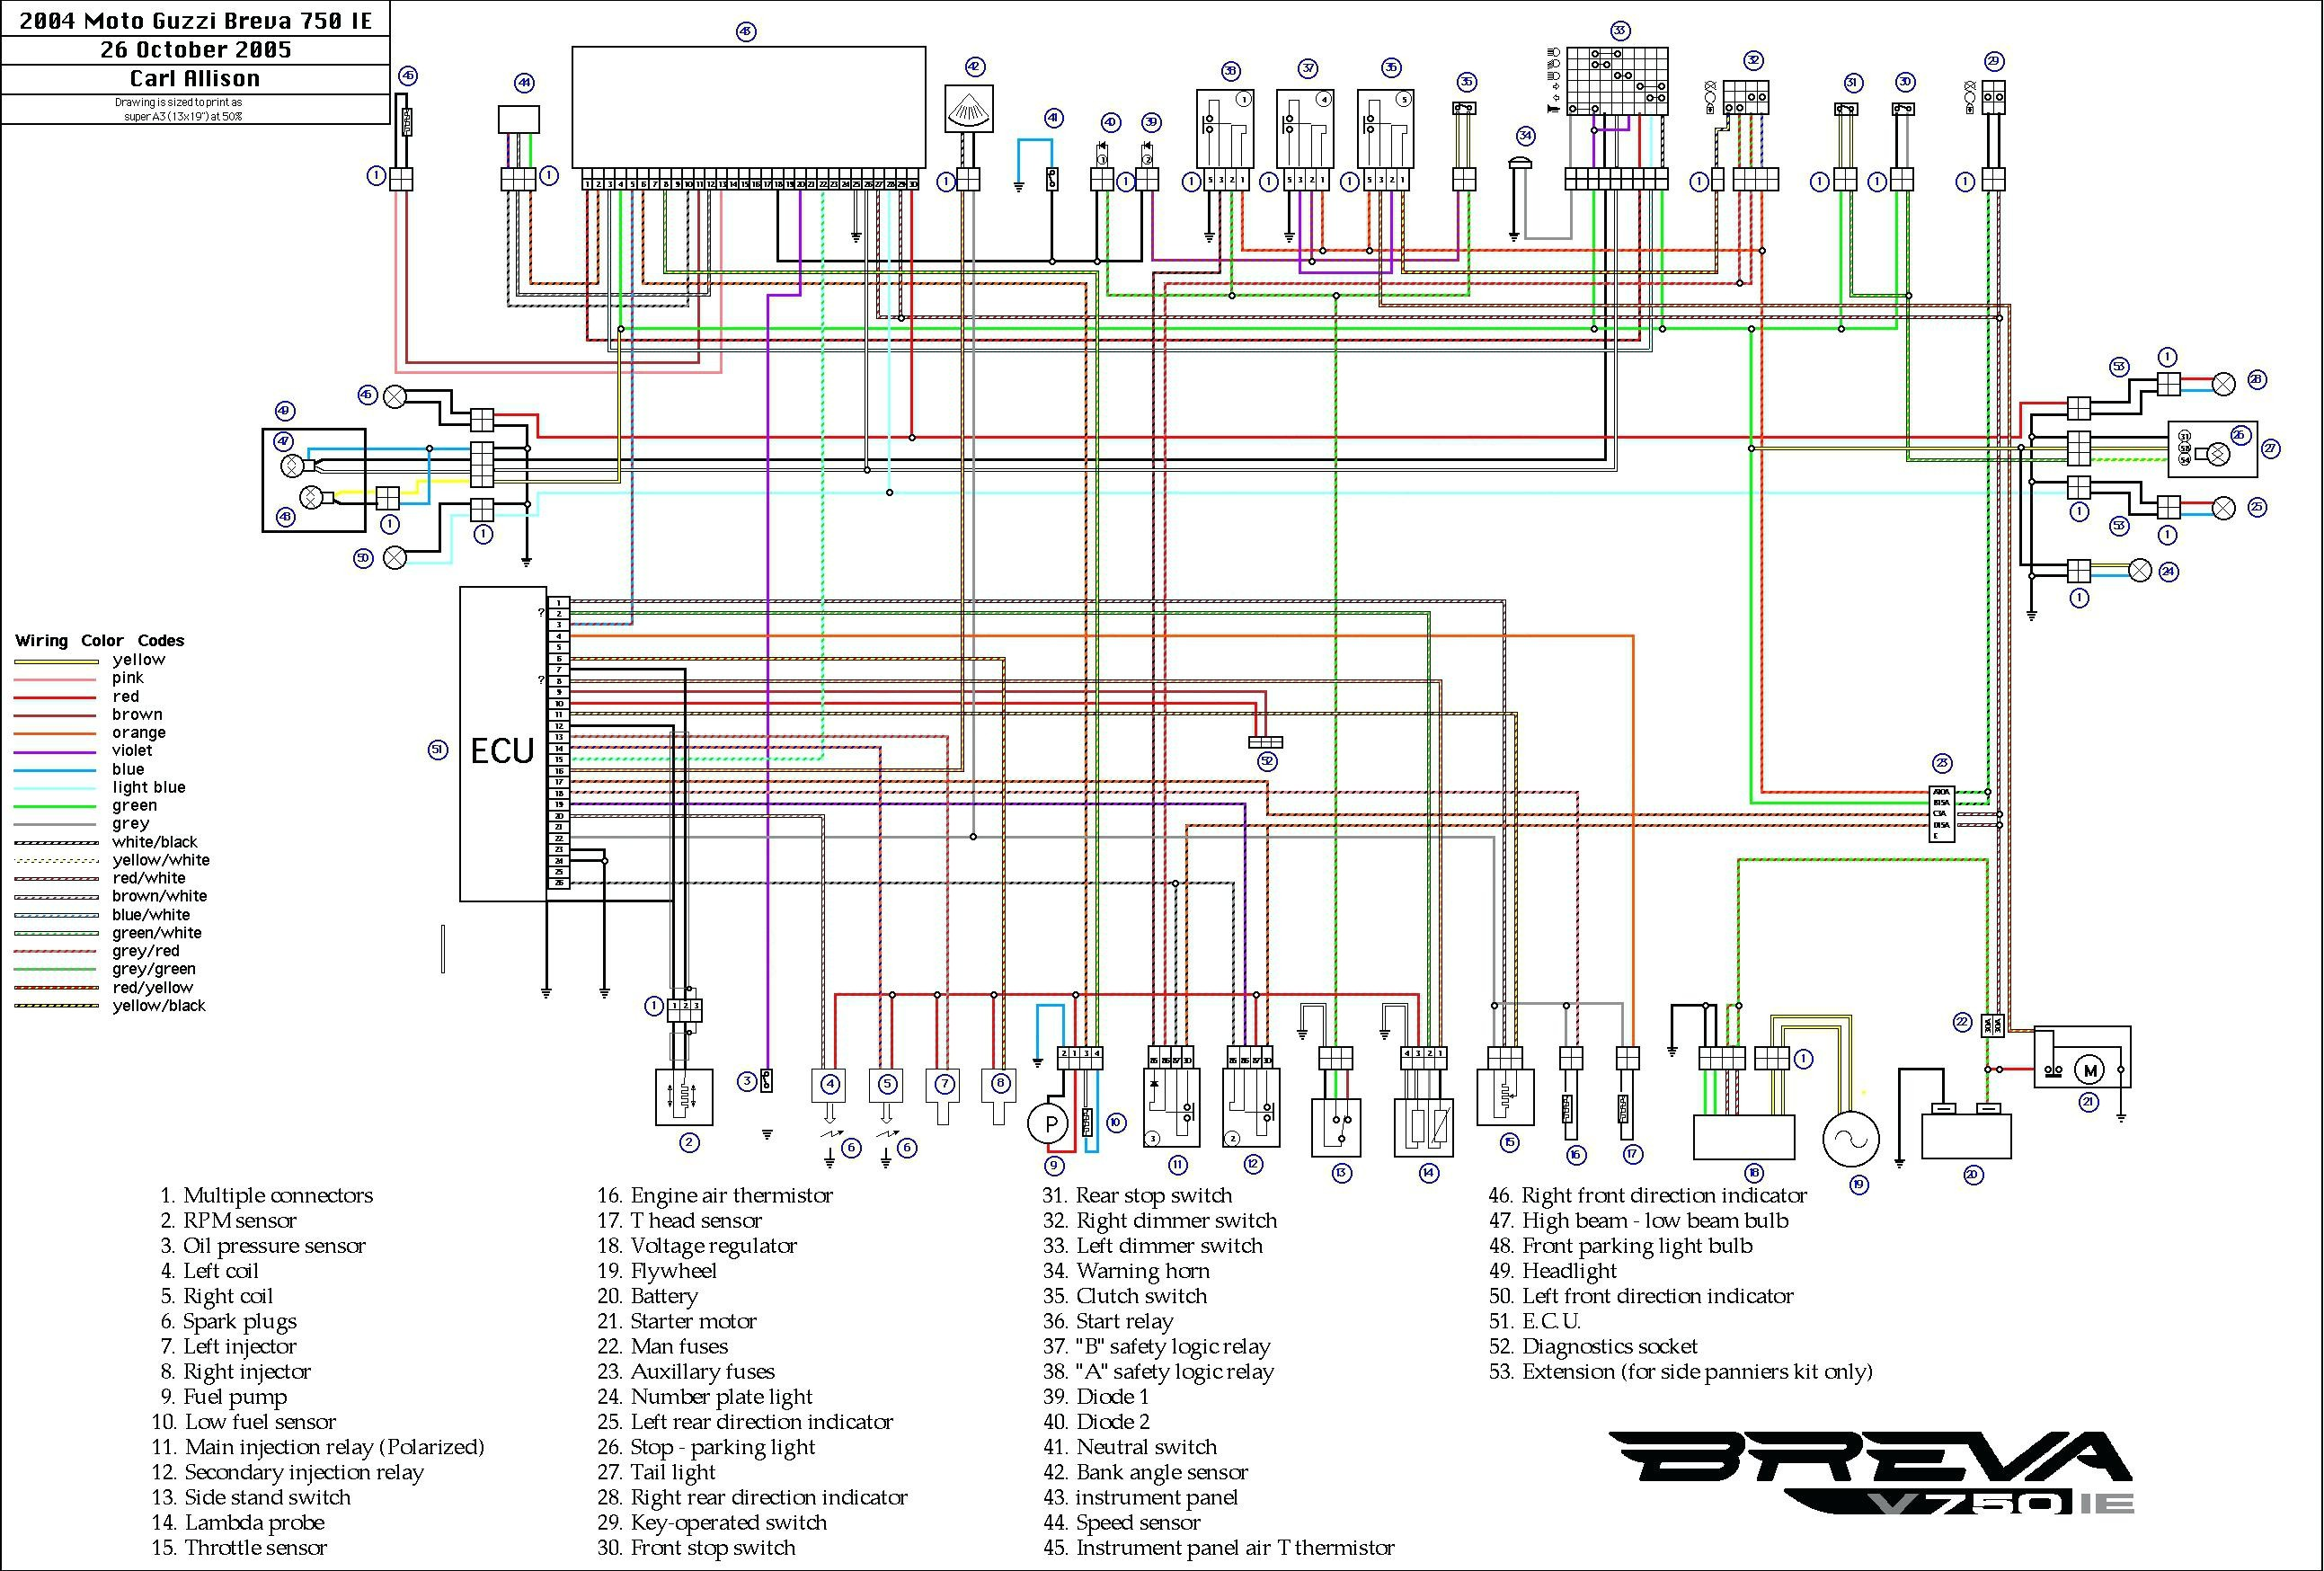 Chrysler Pacifica Engine Diagram Circuit Diagram Maker Line Wiring Dodge Ram Fresh Chrysler Of Chrysler Pacifica Engine Diagram